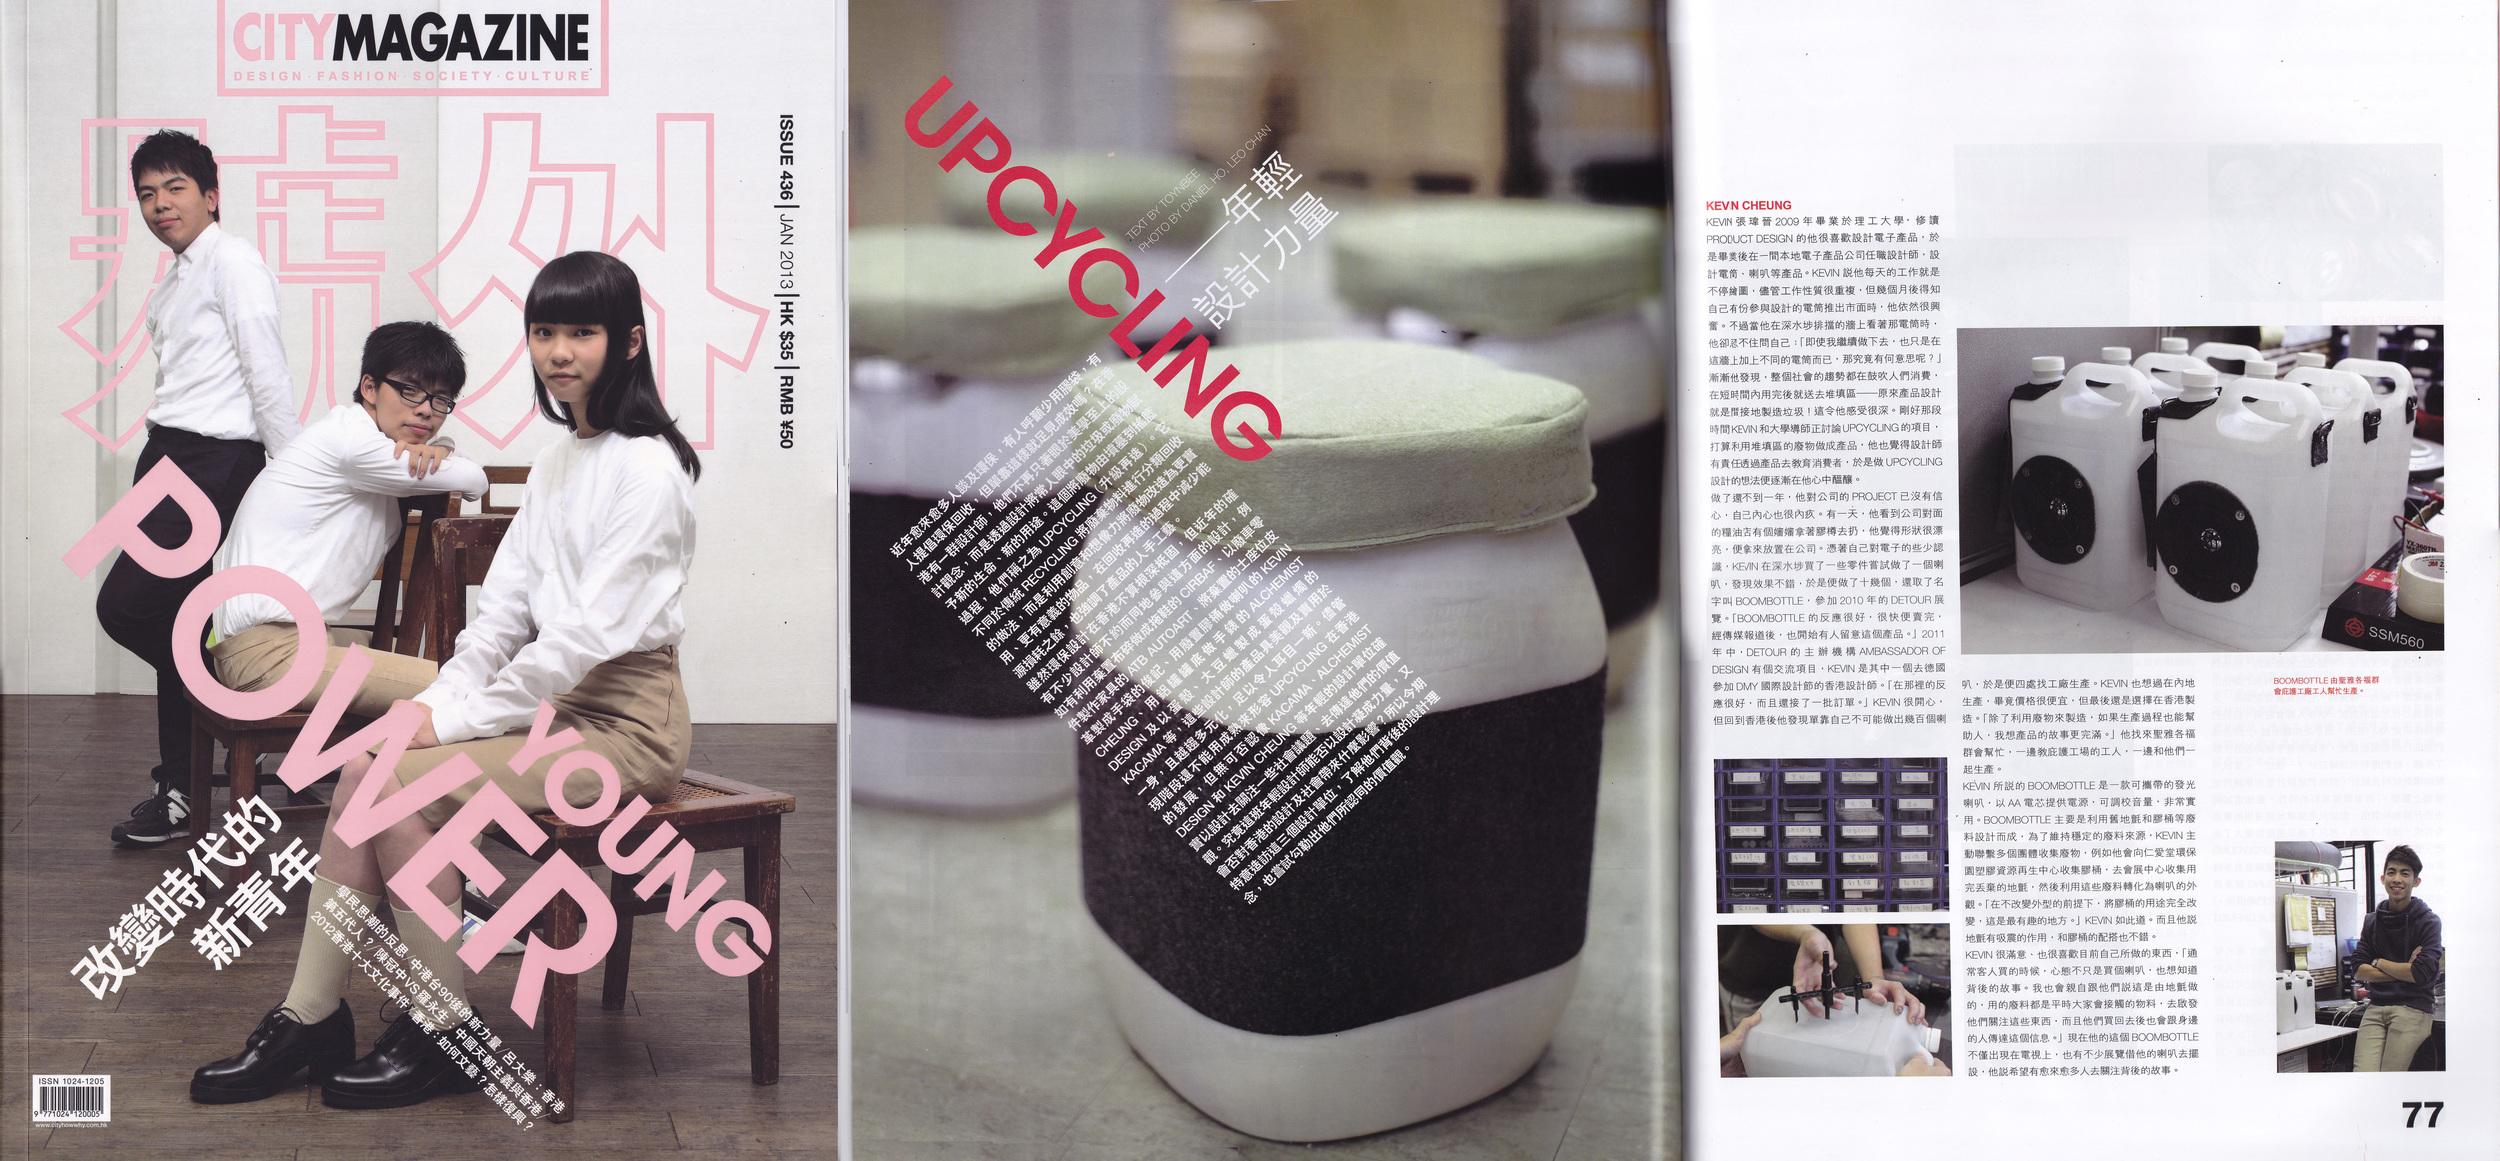 130102 號外 City Magazine.jpg